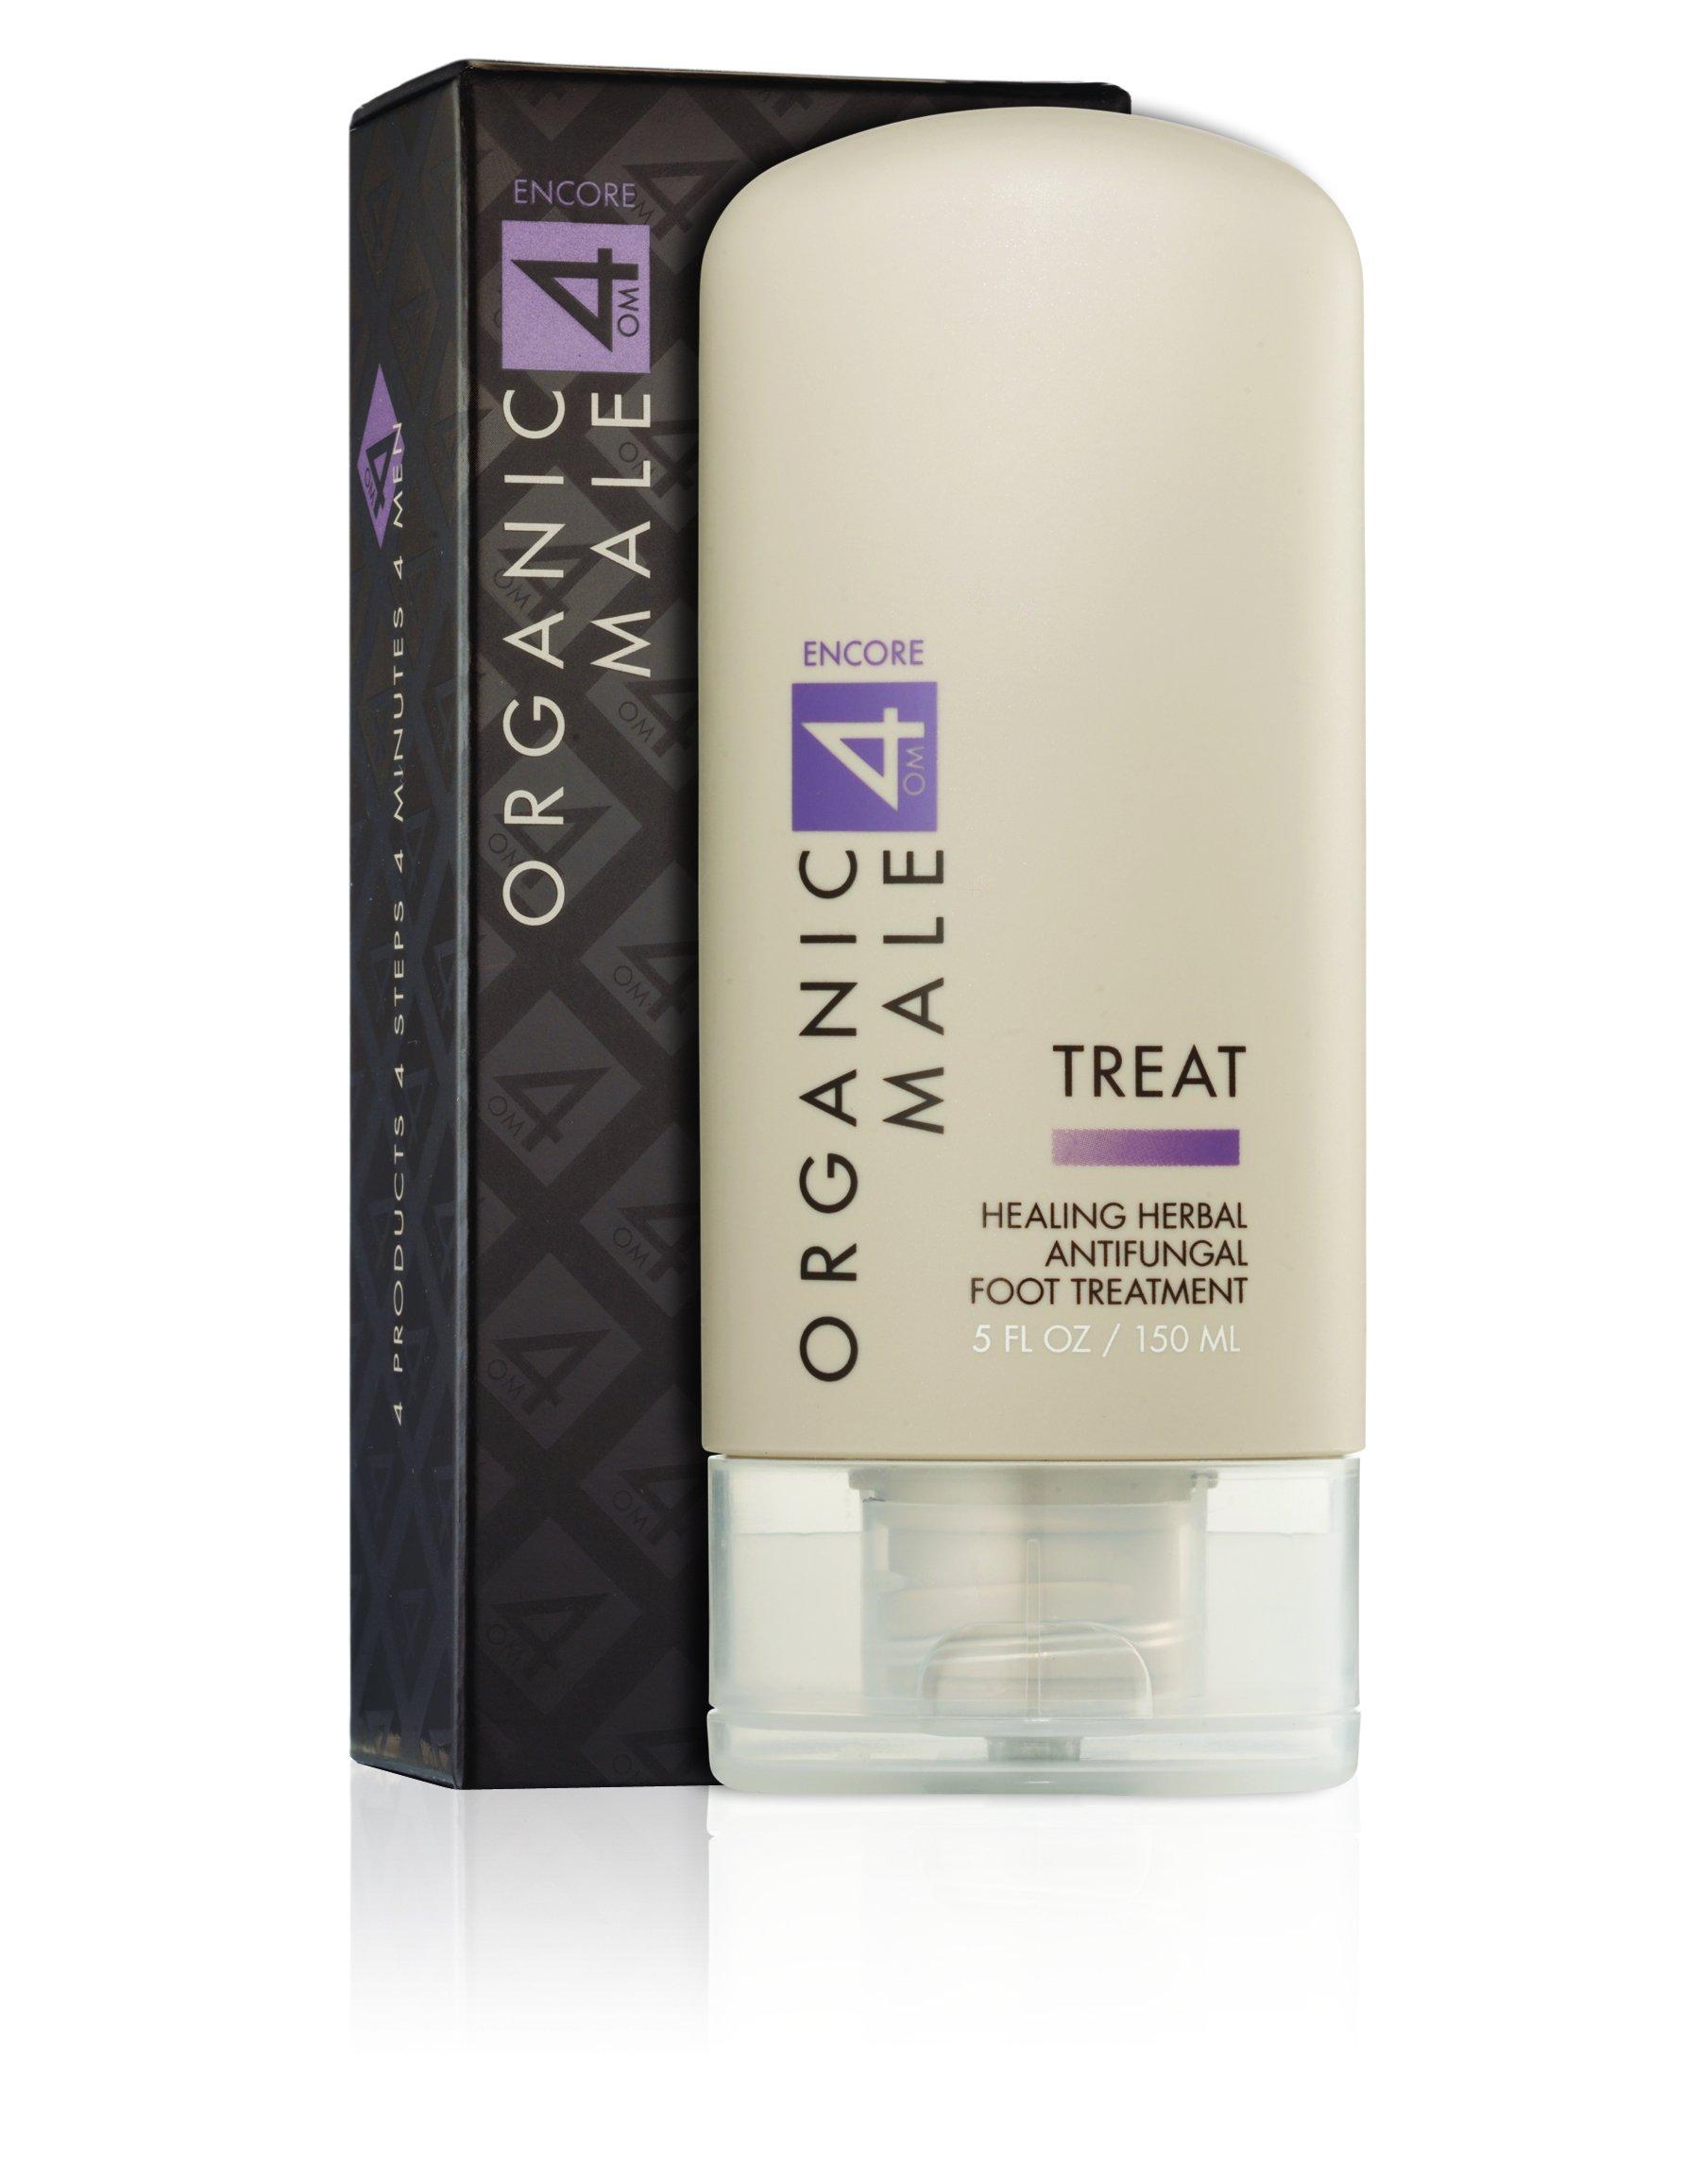 Organic Male OM4 Encore TREAT: Healing Herbal Antifungal Foot Treatment - 5 oz